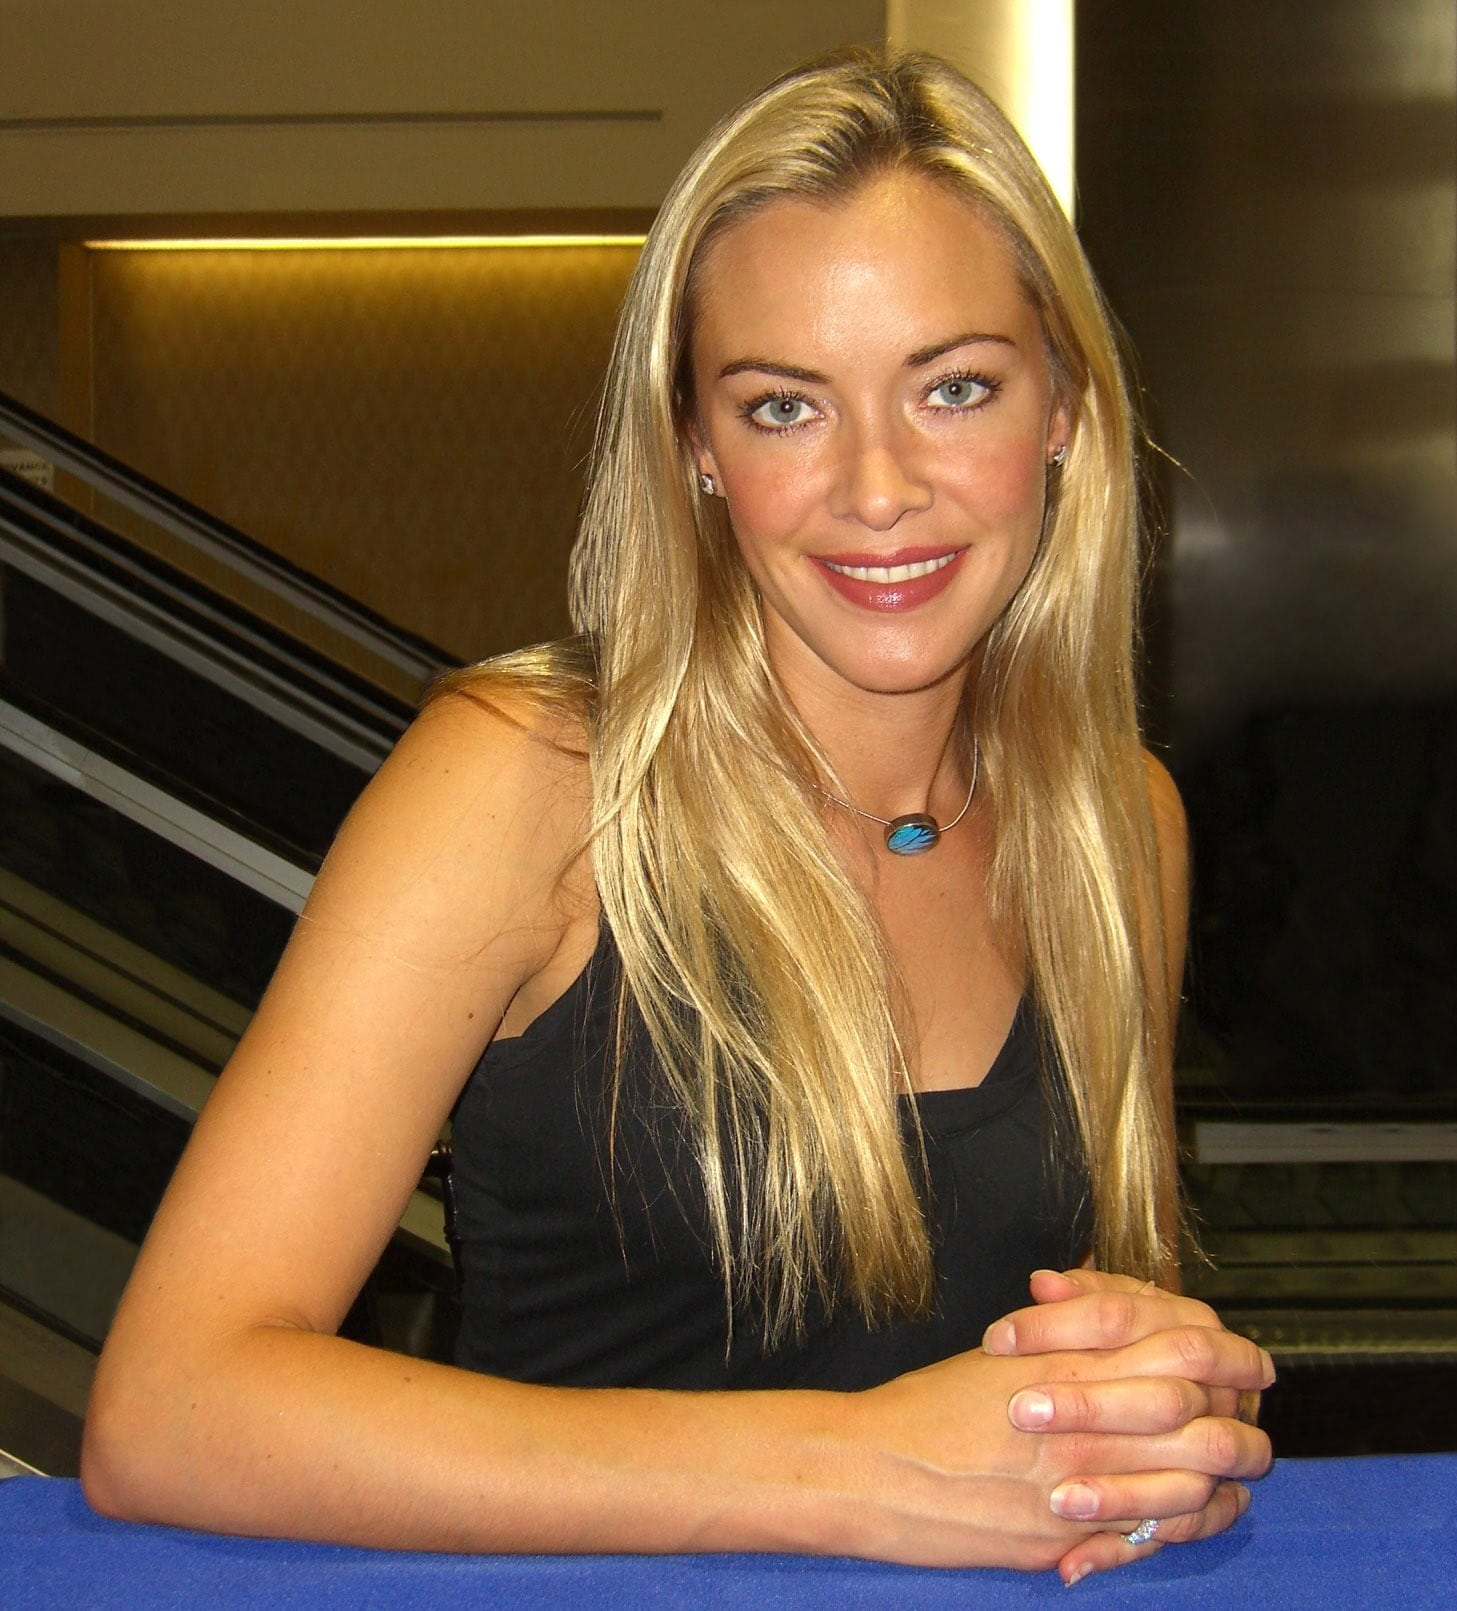 Kristanna Loken American Actress, Model, Producer